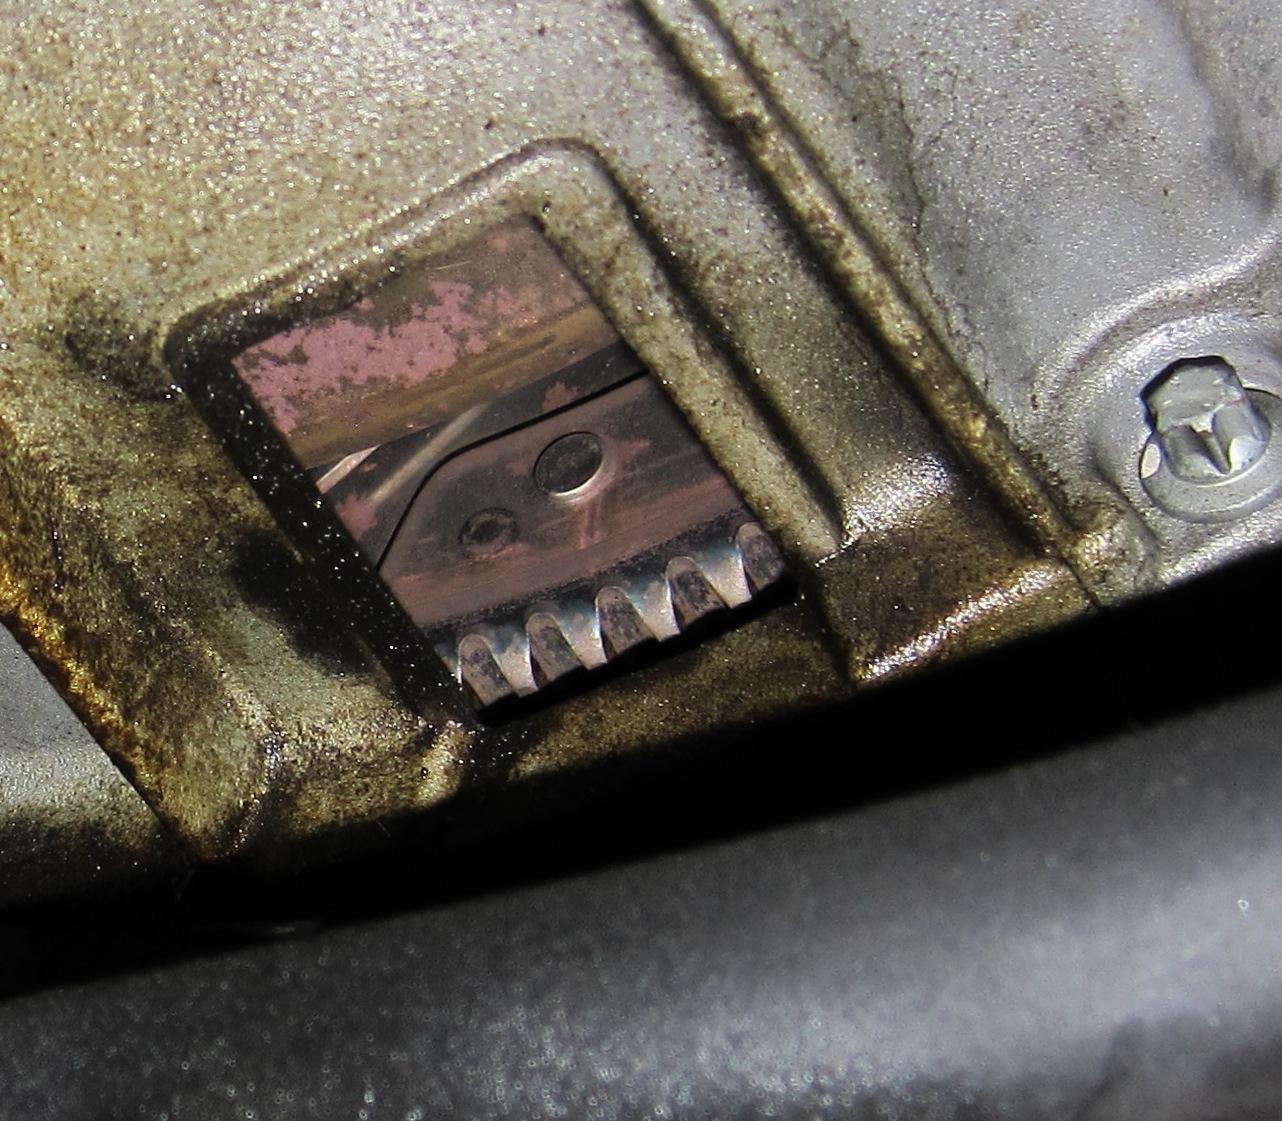 2015 Bmw X5 Transmission: A5S 390R Transmission Flywheel Inspection Cover Missing